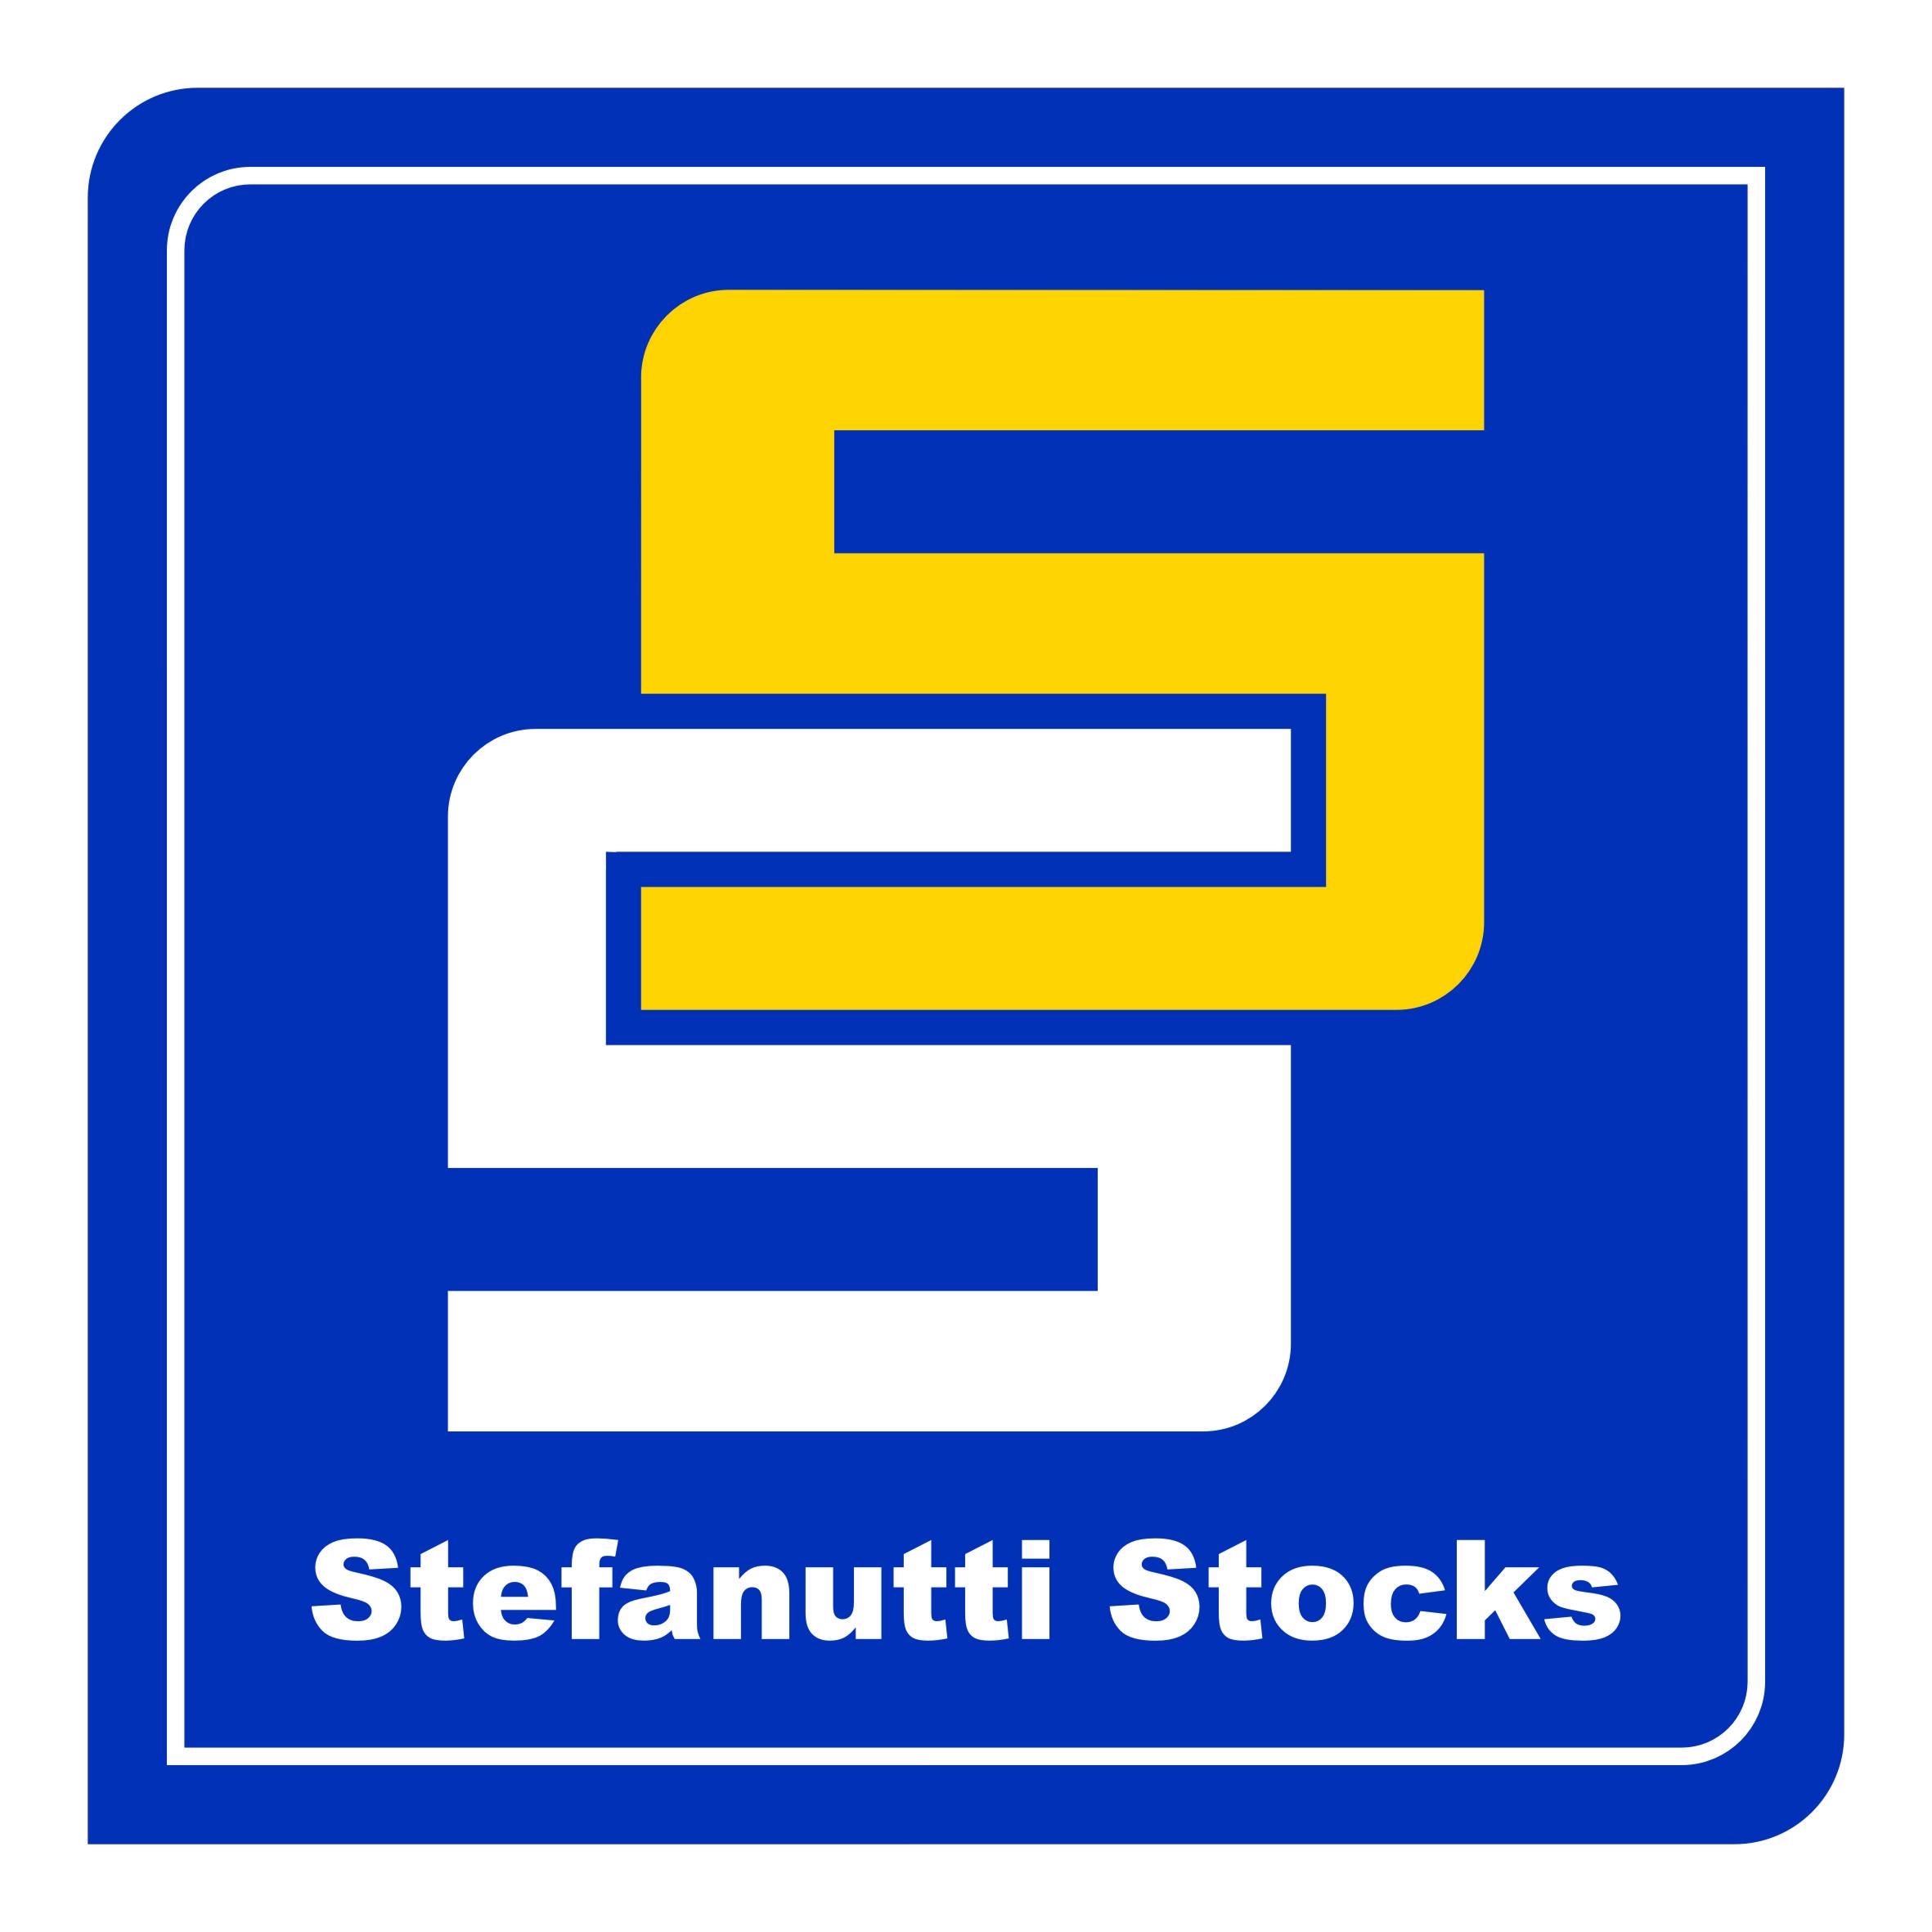 STEFANUTTI STOCKS